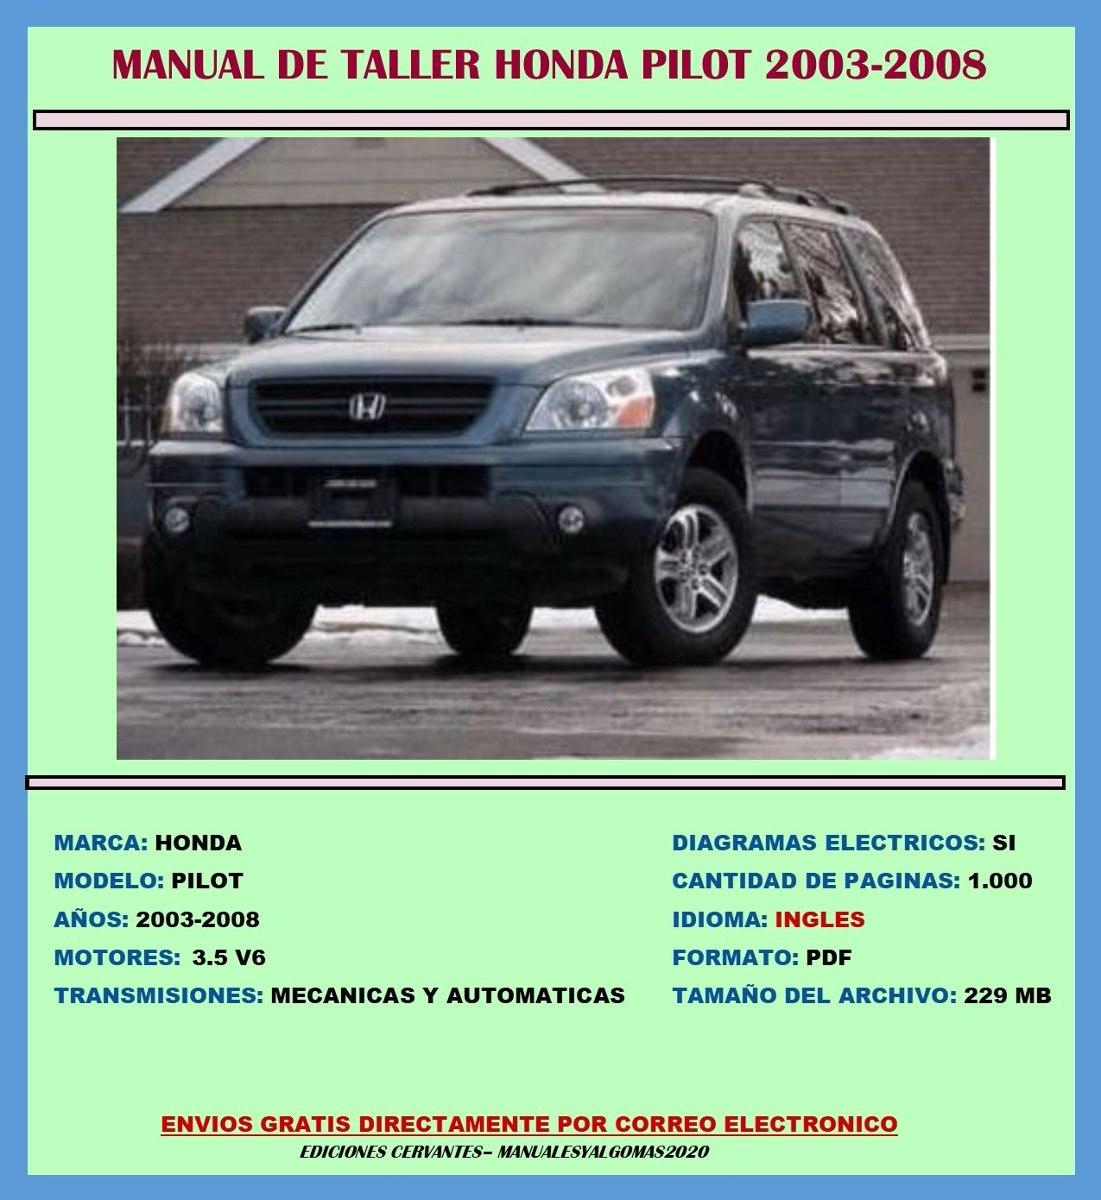 manual de taller reparaci n diagrama honda pilot 2003 2008 bs 27 rh articulo mercadolibre com ve 2006 honda pilot manual 2007 honda pilot manual pdf